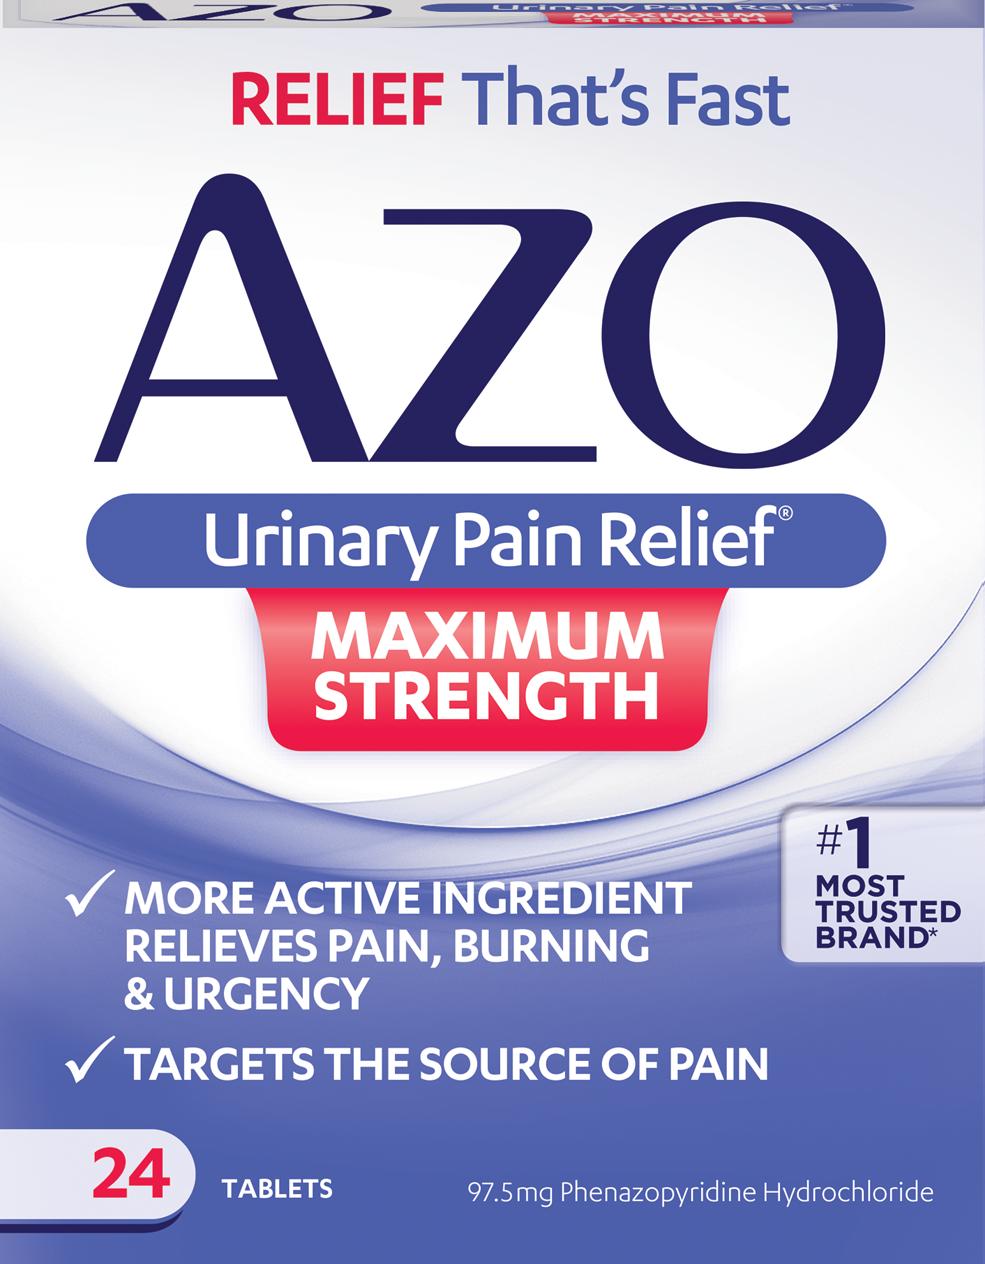 AZO Urinary Pain Relief Max Strength forecast